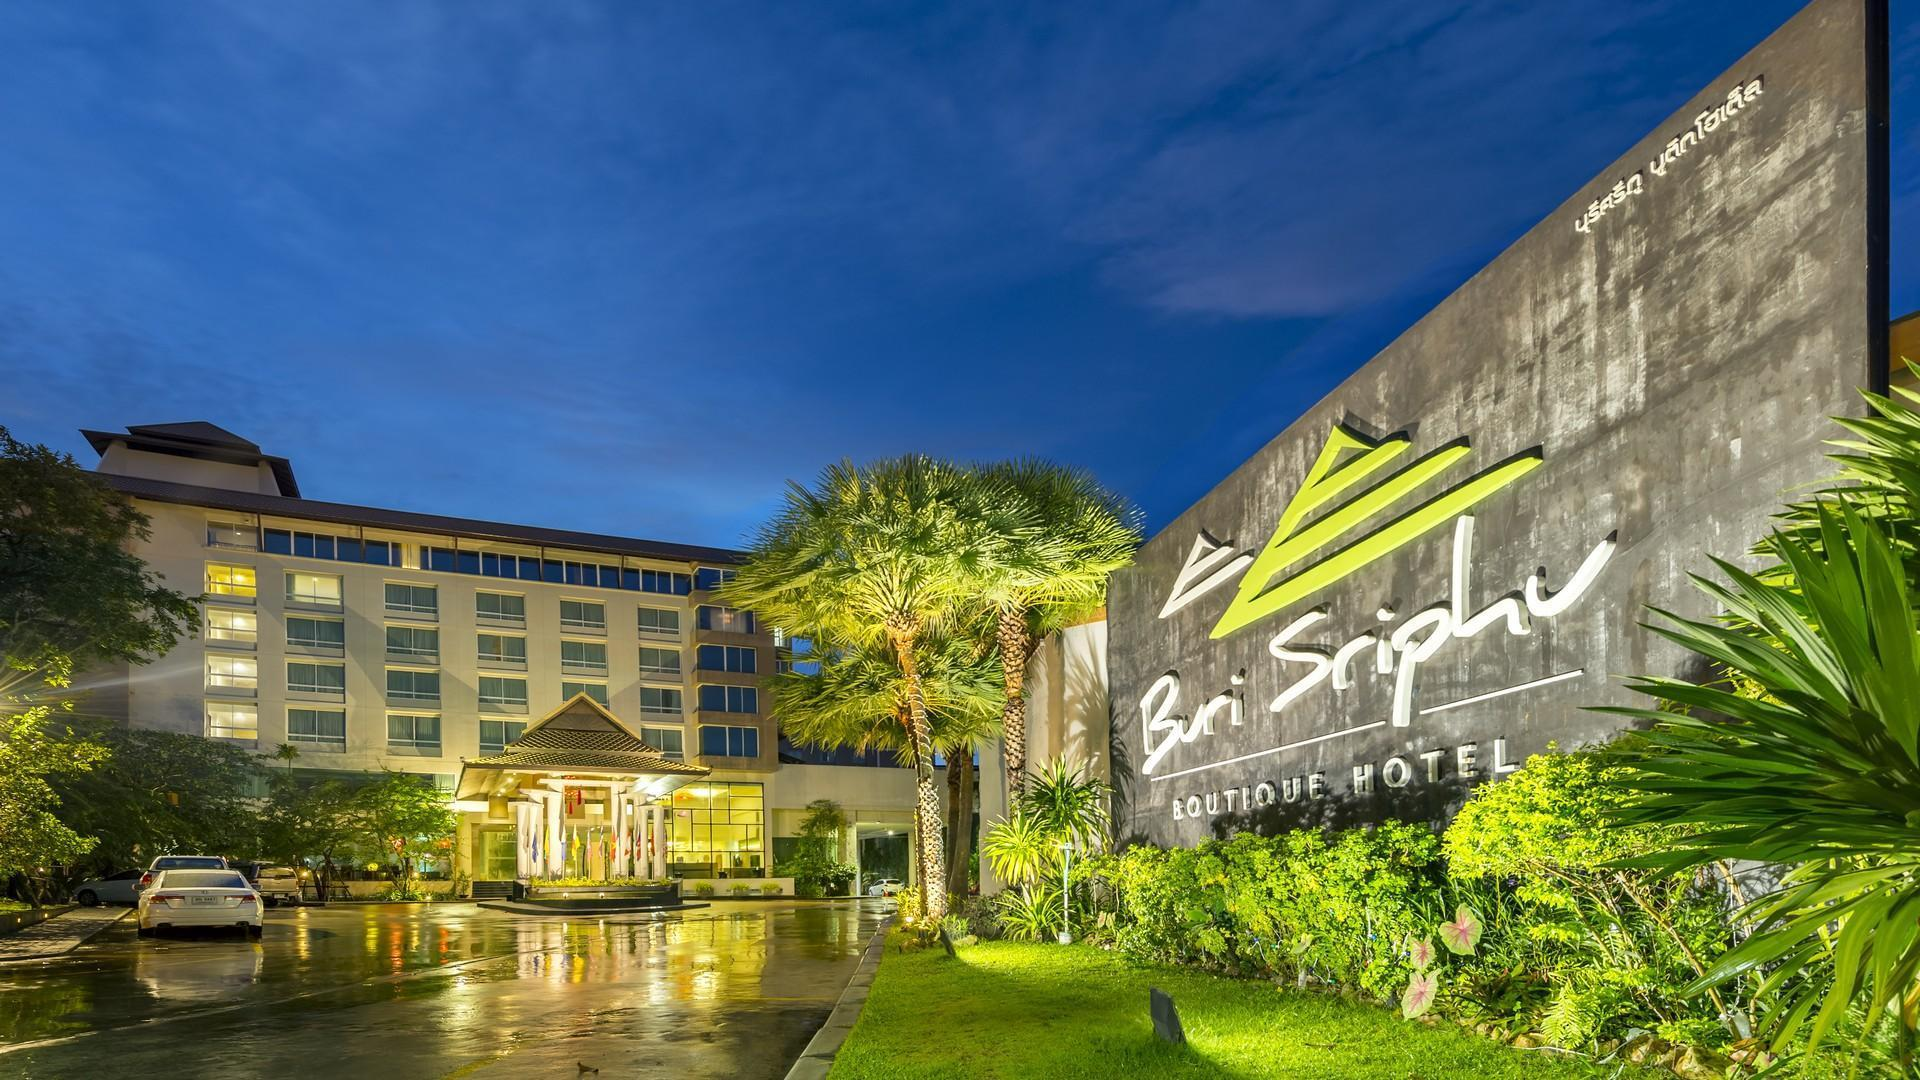 Buri Sriphu Hotel & Convention Centre บุรีศรีภู โฮเต็ล แอนด์ คอนเวนชั่น เซ็นเตอร์